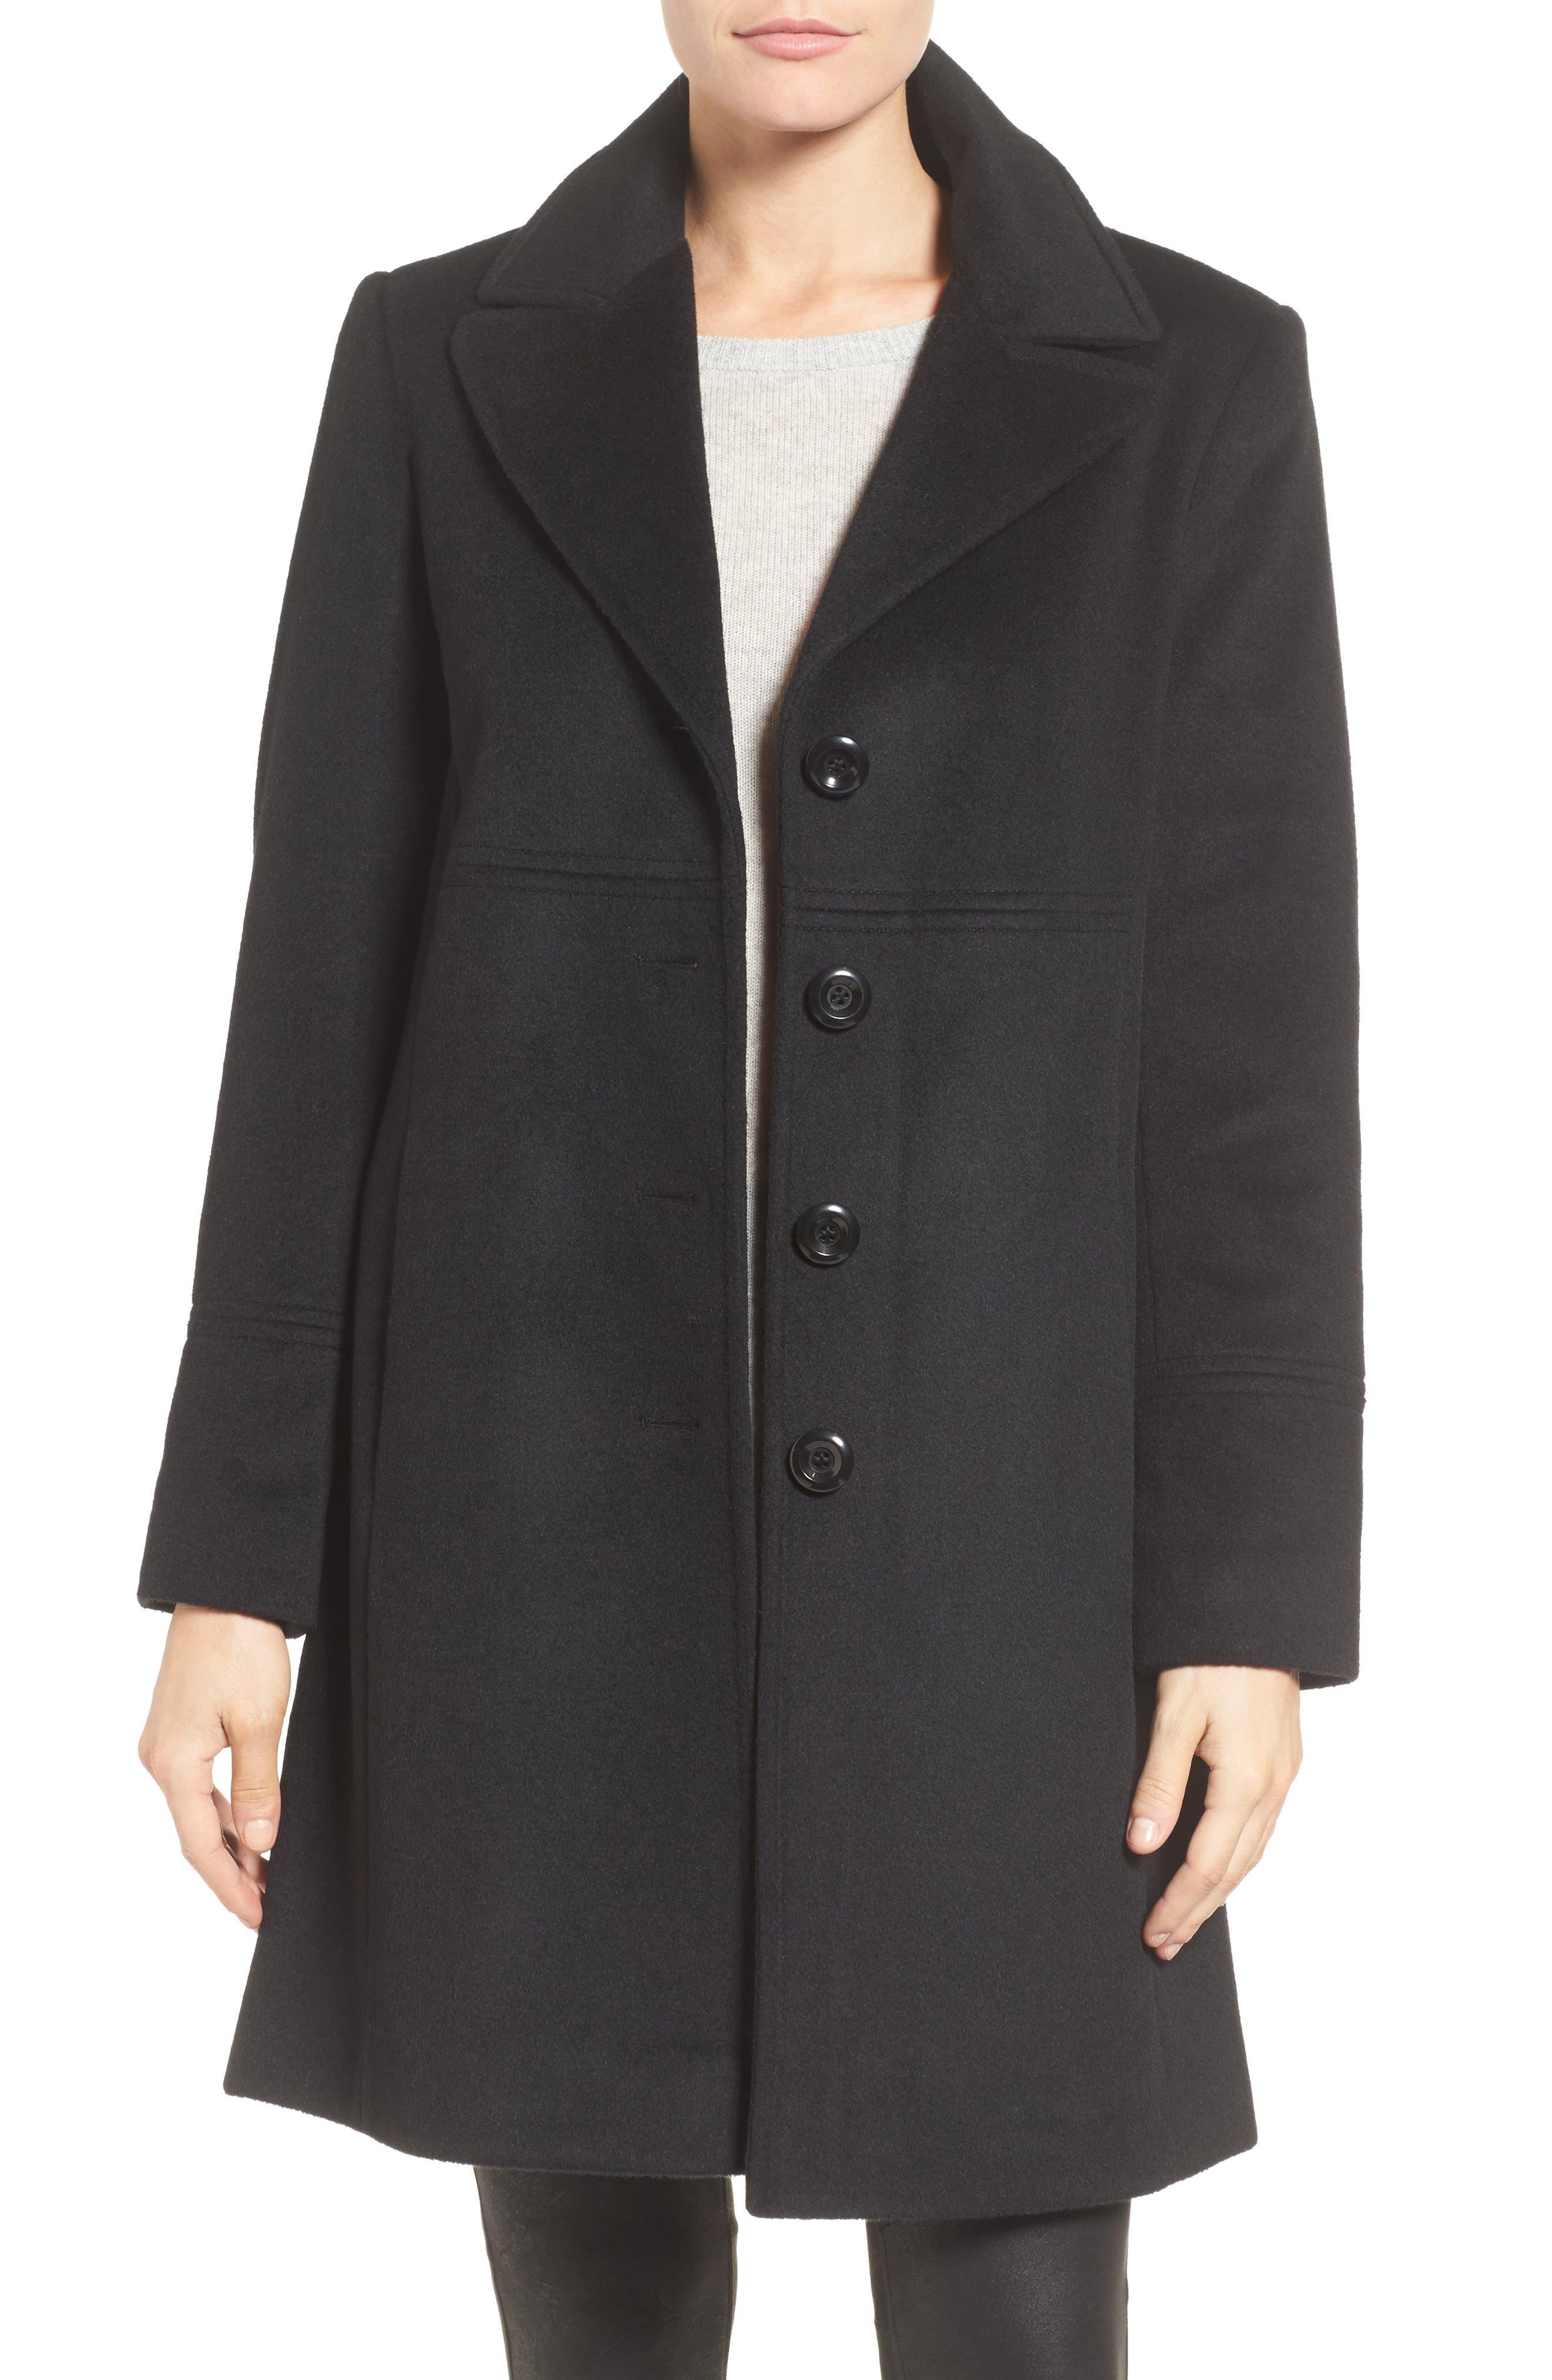 Main Image - Larry Levine Notch Collar Wool Blend Coat